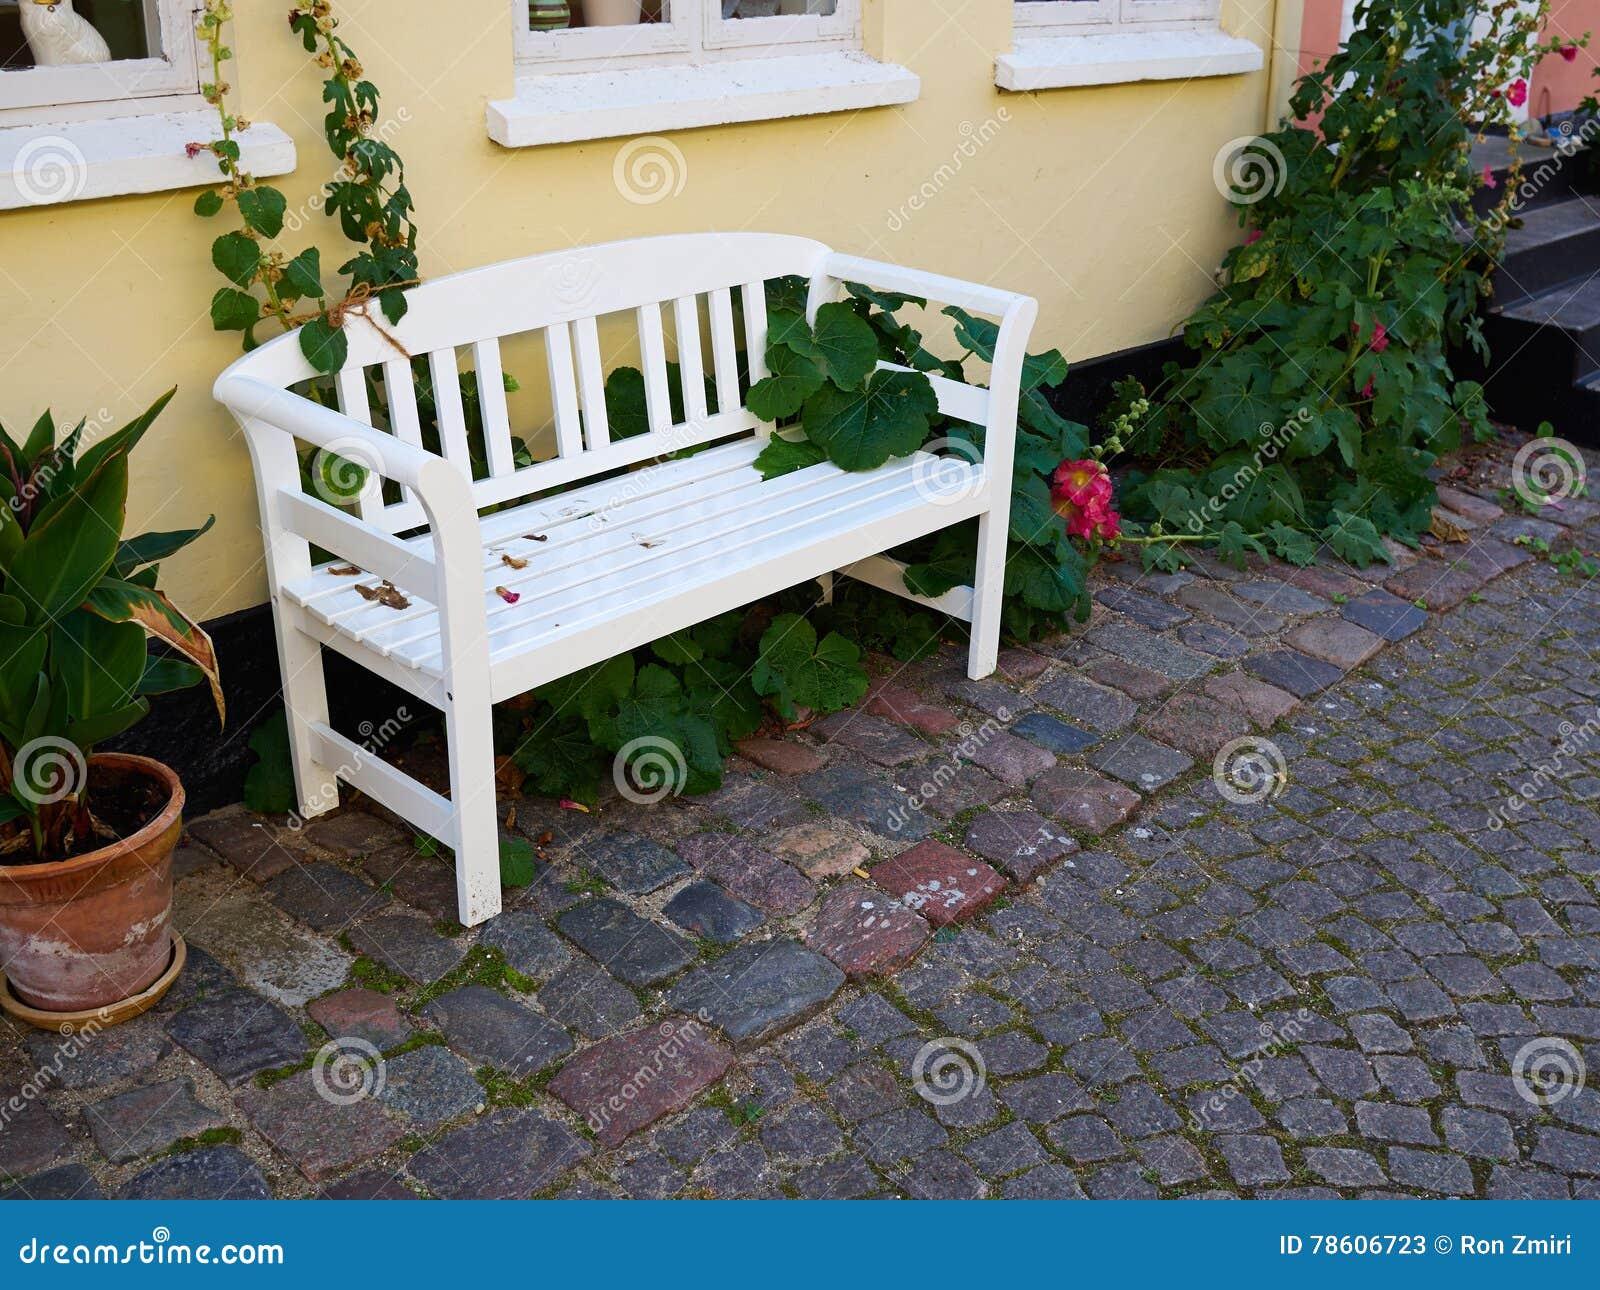 Beautiful Garden Wooden Bench Seating Corner Stock Image ... on wooden deck bench design, wooden work bench table, bed design, wood seat design, wooden garden bench, wooden curved bench seating, unique wood bench design, garden seat design, wooden outdoor bench ideas, patio seat design, wooden deck with bench,